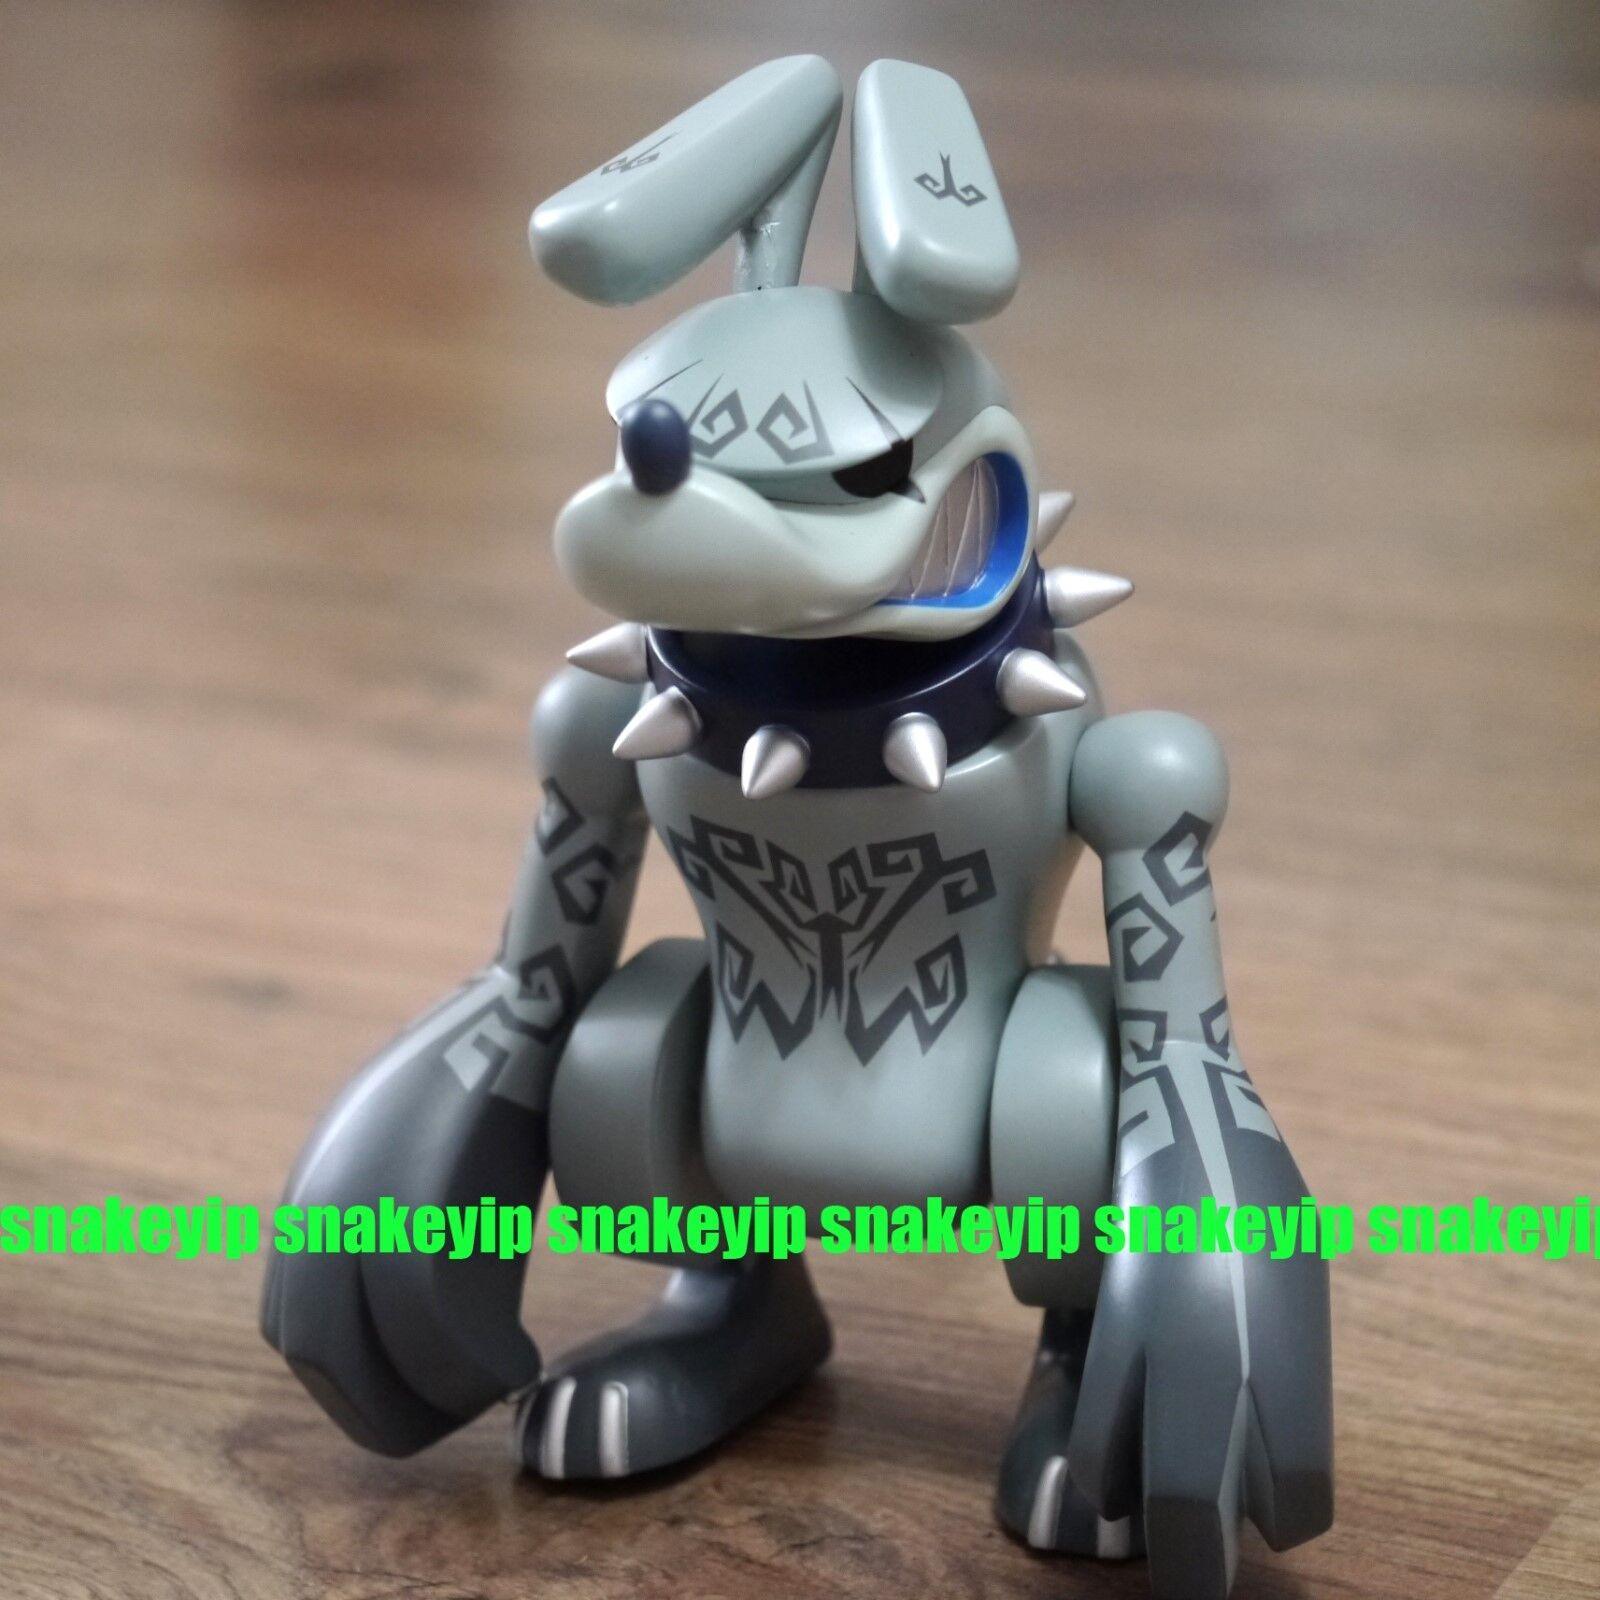 Toy2R TOUMA Toumart Hell Hound Hell Gate Guard LTD300 NOS + Kidrobot Bonus